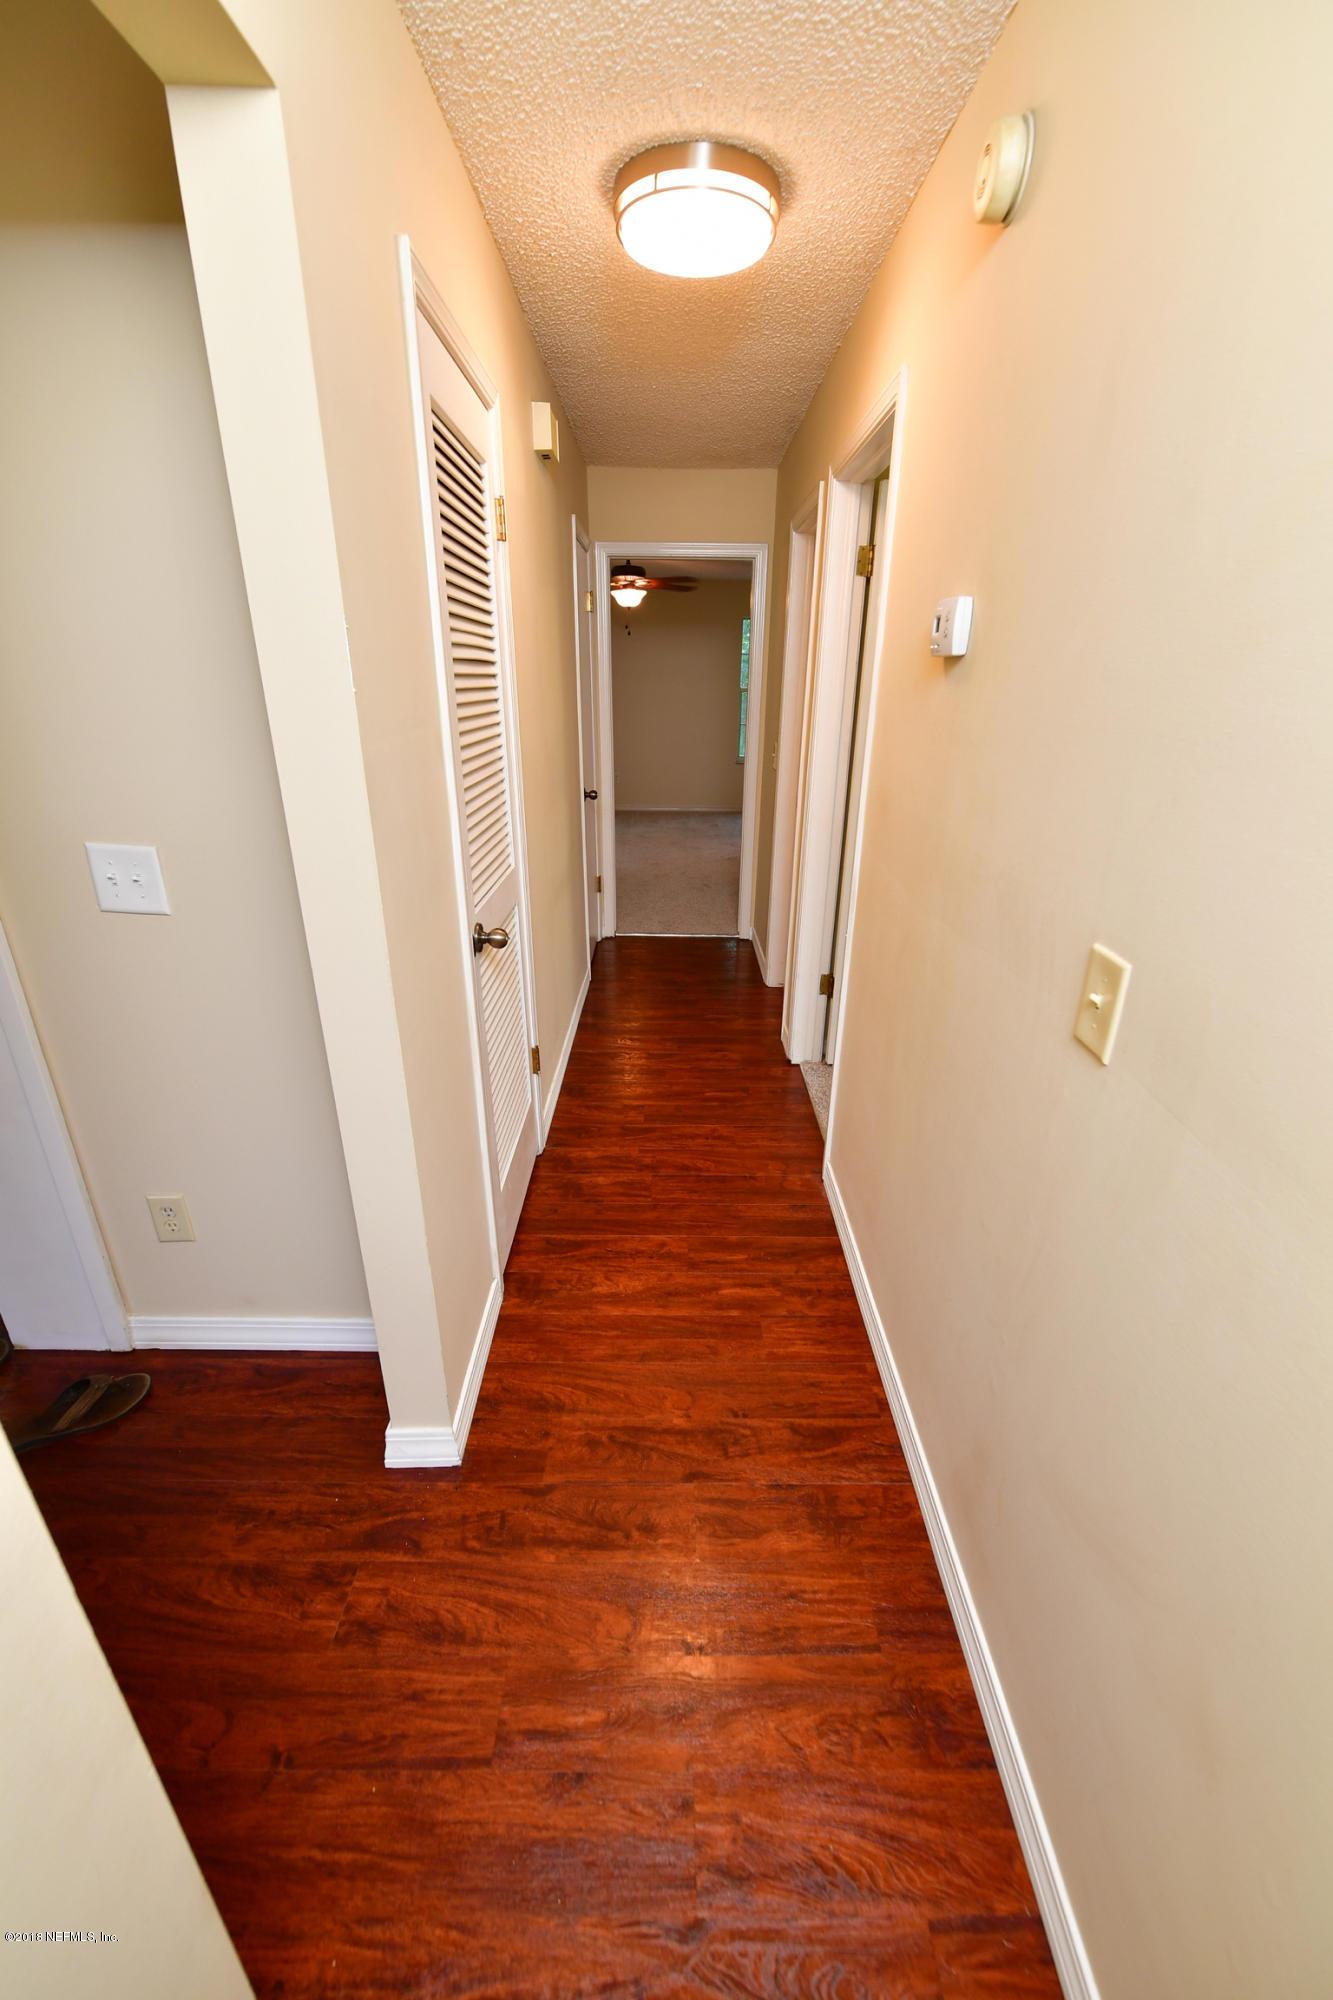 3263 CORMORANT, JACKSONVILLE, FLORIDA 32223, 3 Bedrooms Bedrooms, ,2 BathroomsBathrooms,Residential - single family,For sale,CORMORANT,948087